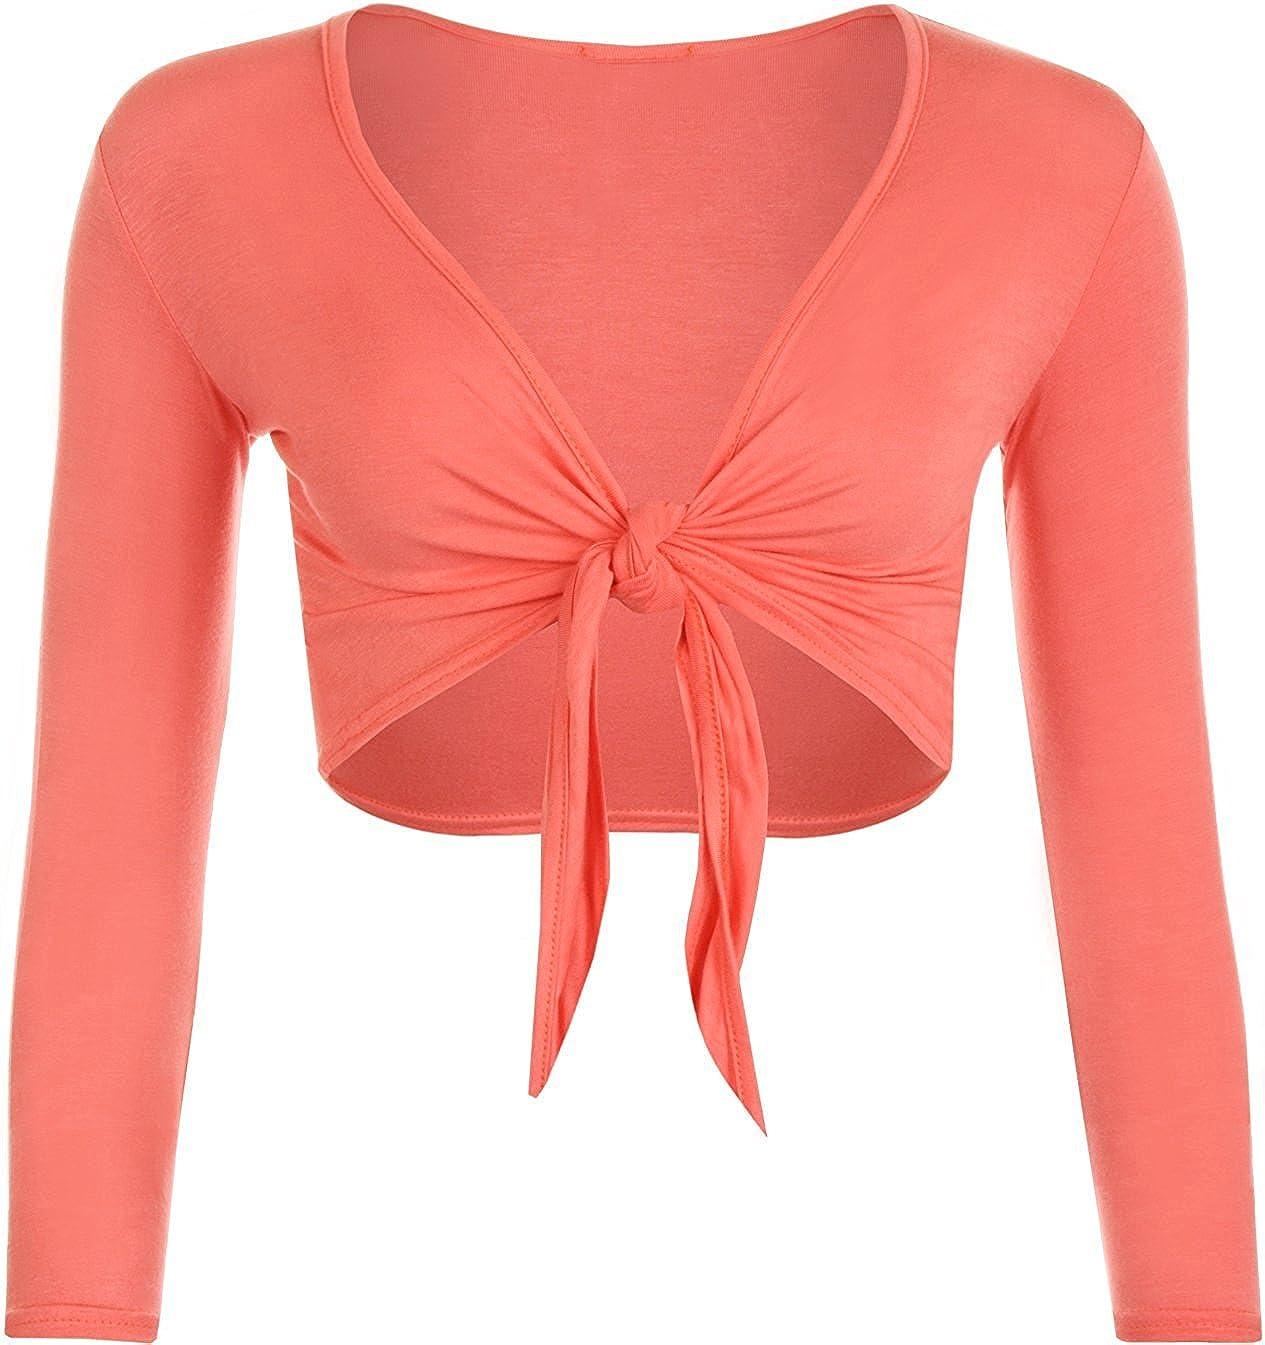 Womens Tie Knot Shrug Short Ladies Crop Cardigan Wrap Bolero Top Plus Size 8-22 Red